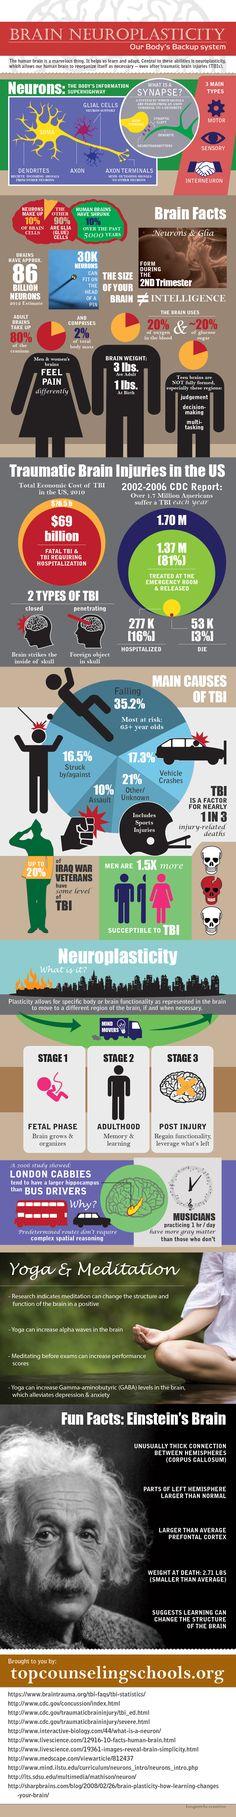 Brain Neuroplasticity  yoga good =  [INFOGRAPHIC] #brain #neuroplasticity